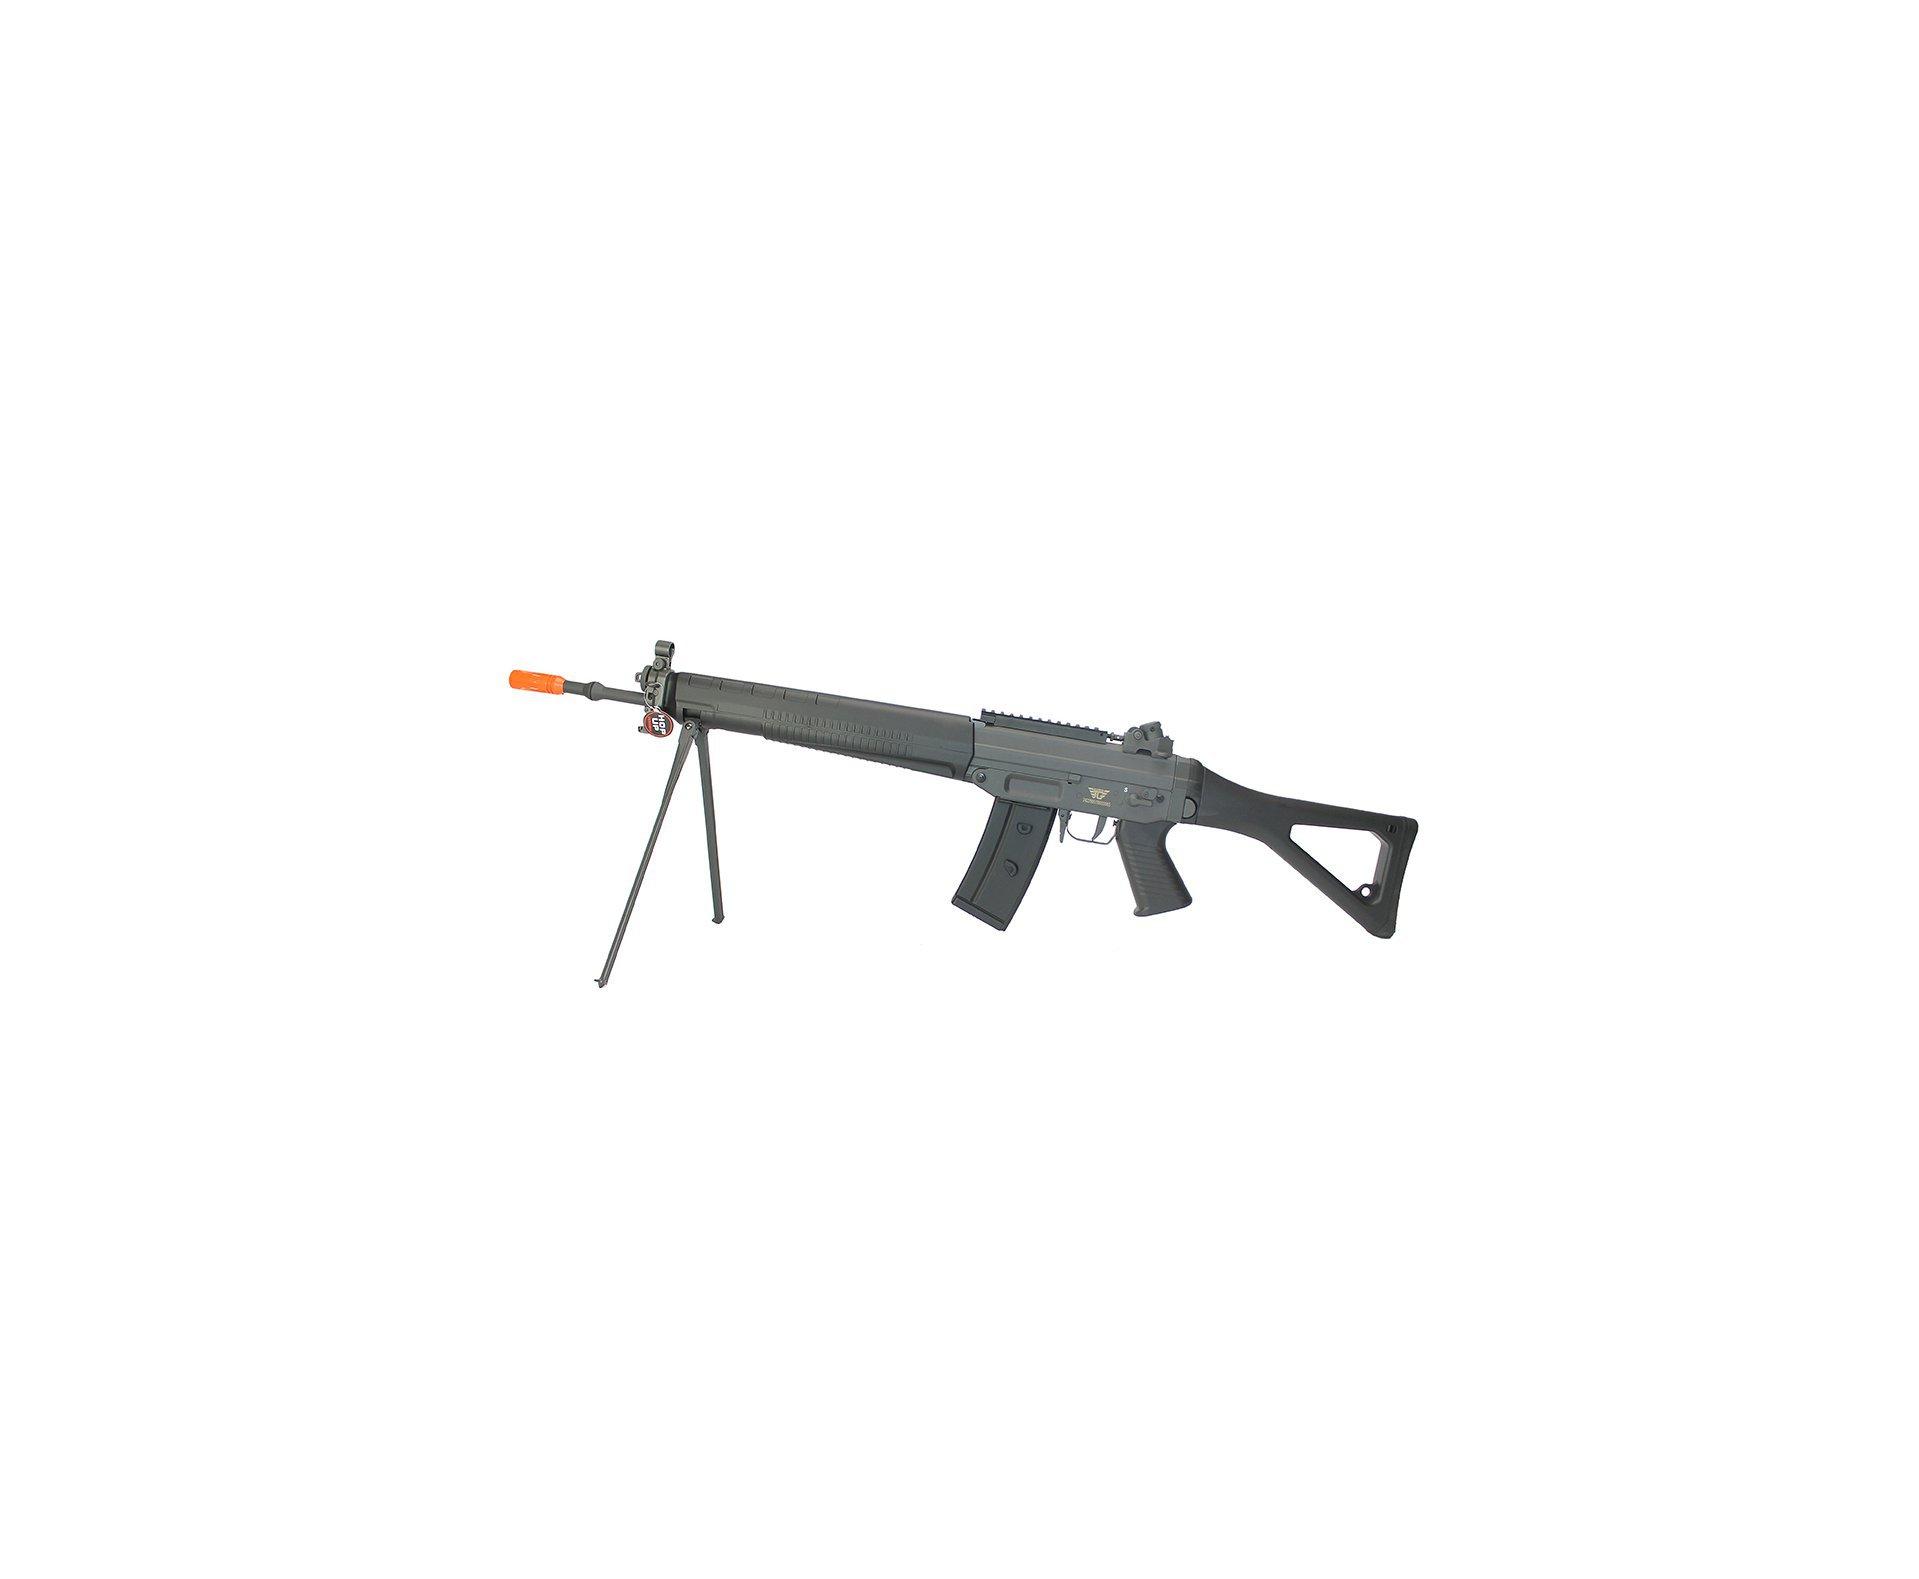 Rifle De Airsoft Seal Sig-080 S-550 Jing Gong Aeg Cal 6.0mm